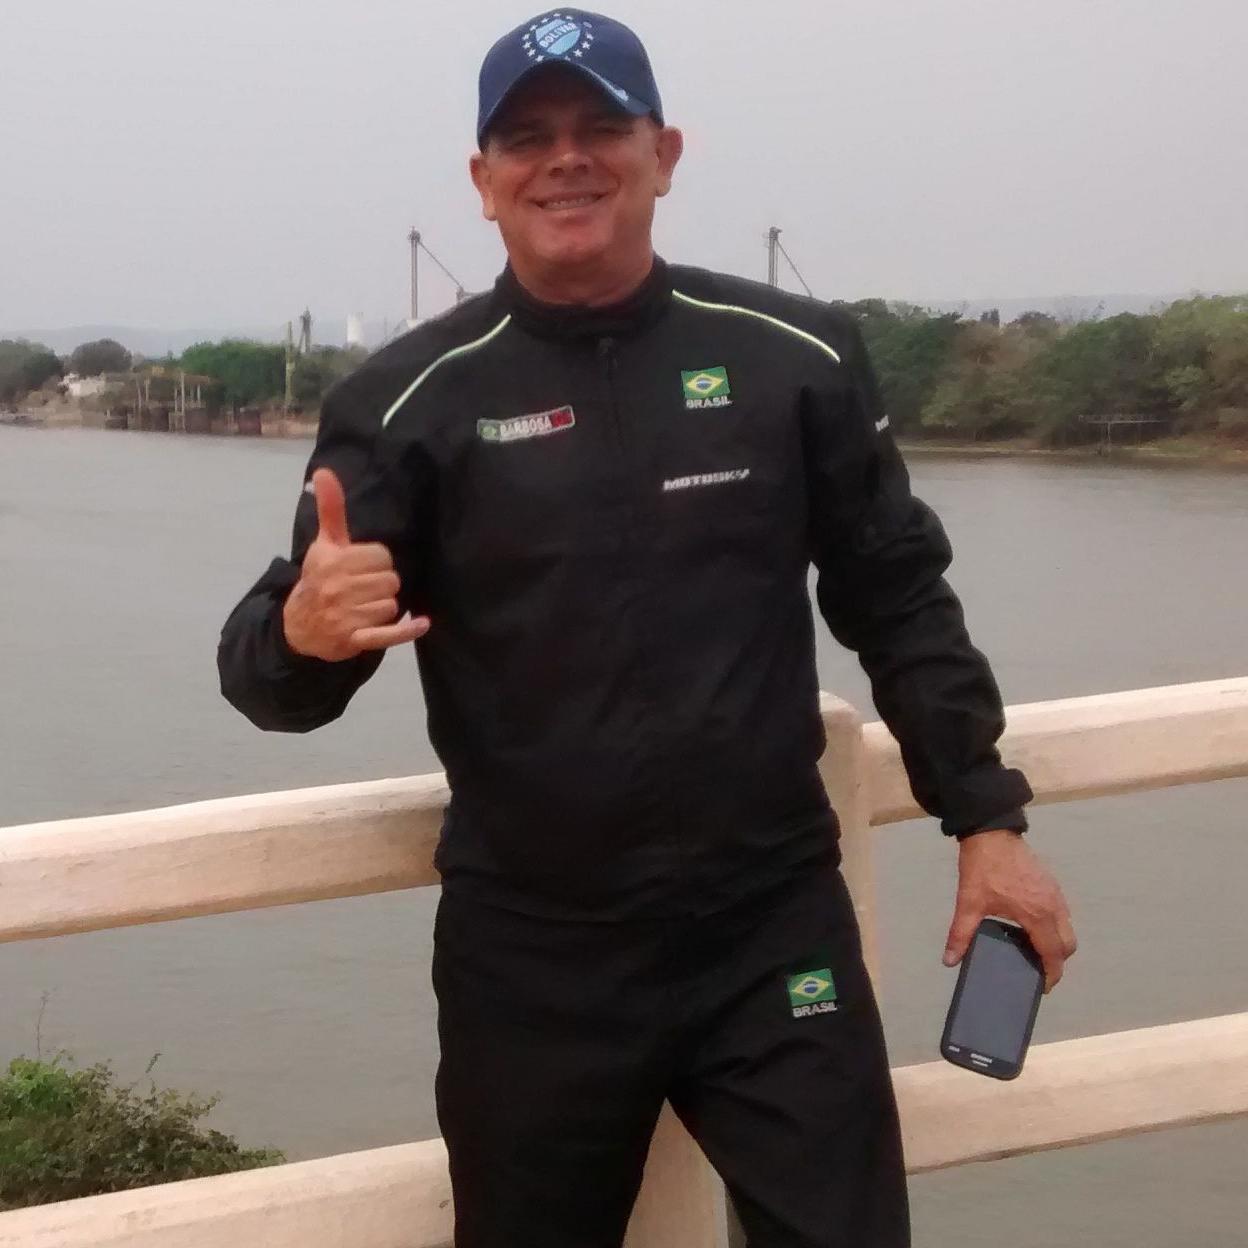 Aroldo Paulo Barbosa